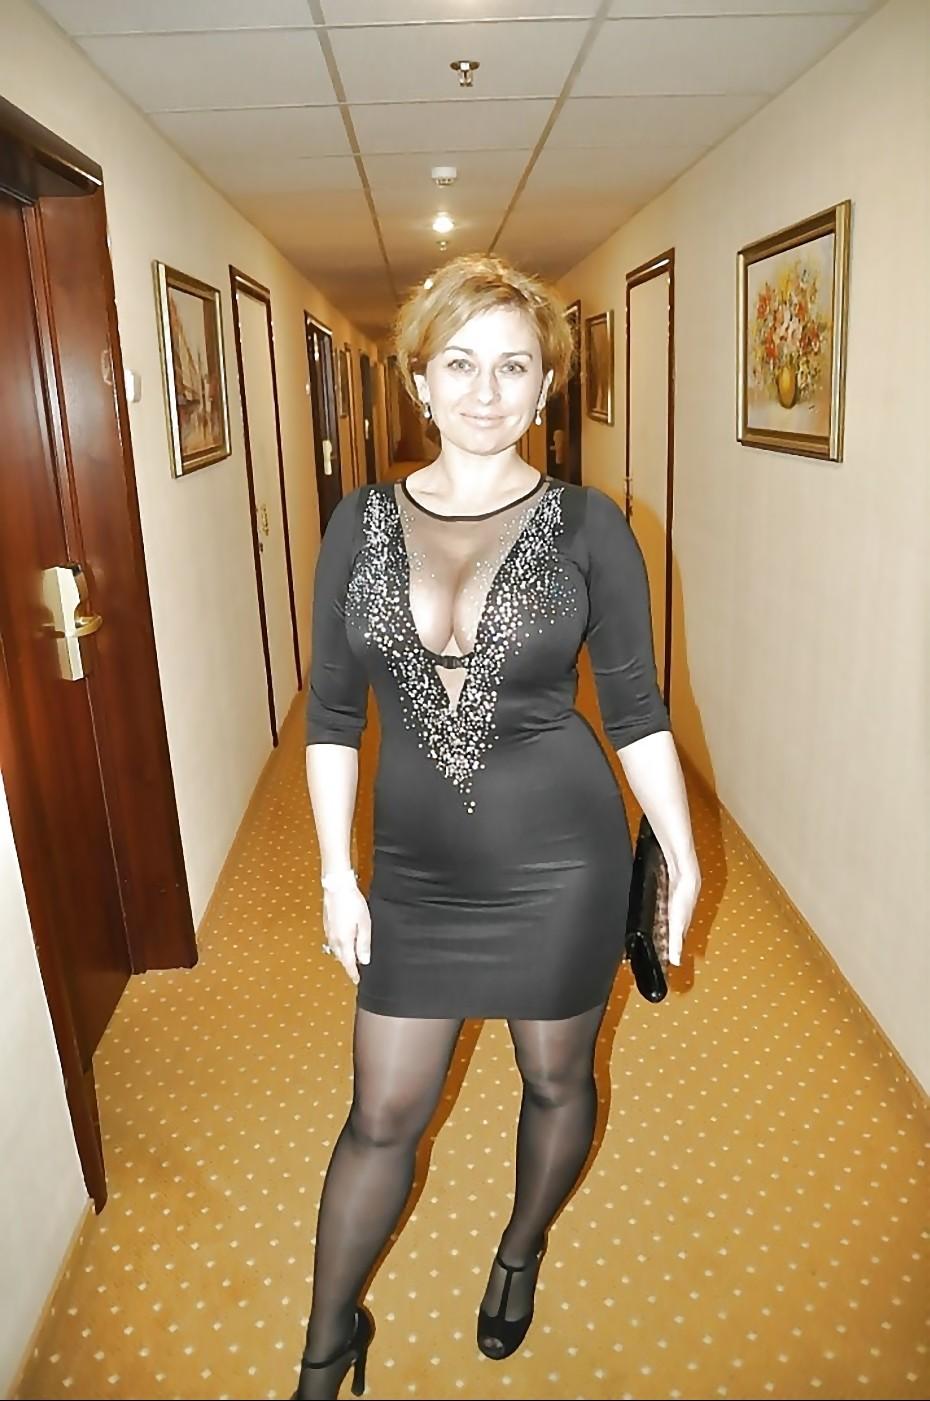 Русская взрослая женщина фото